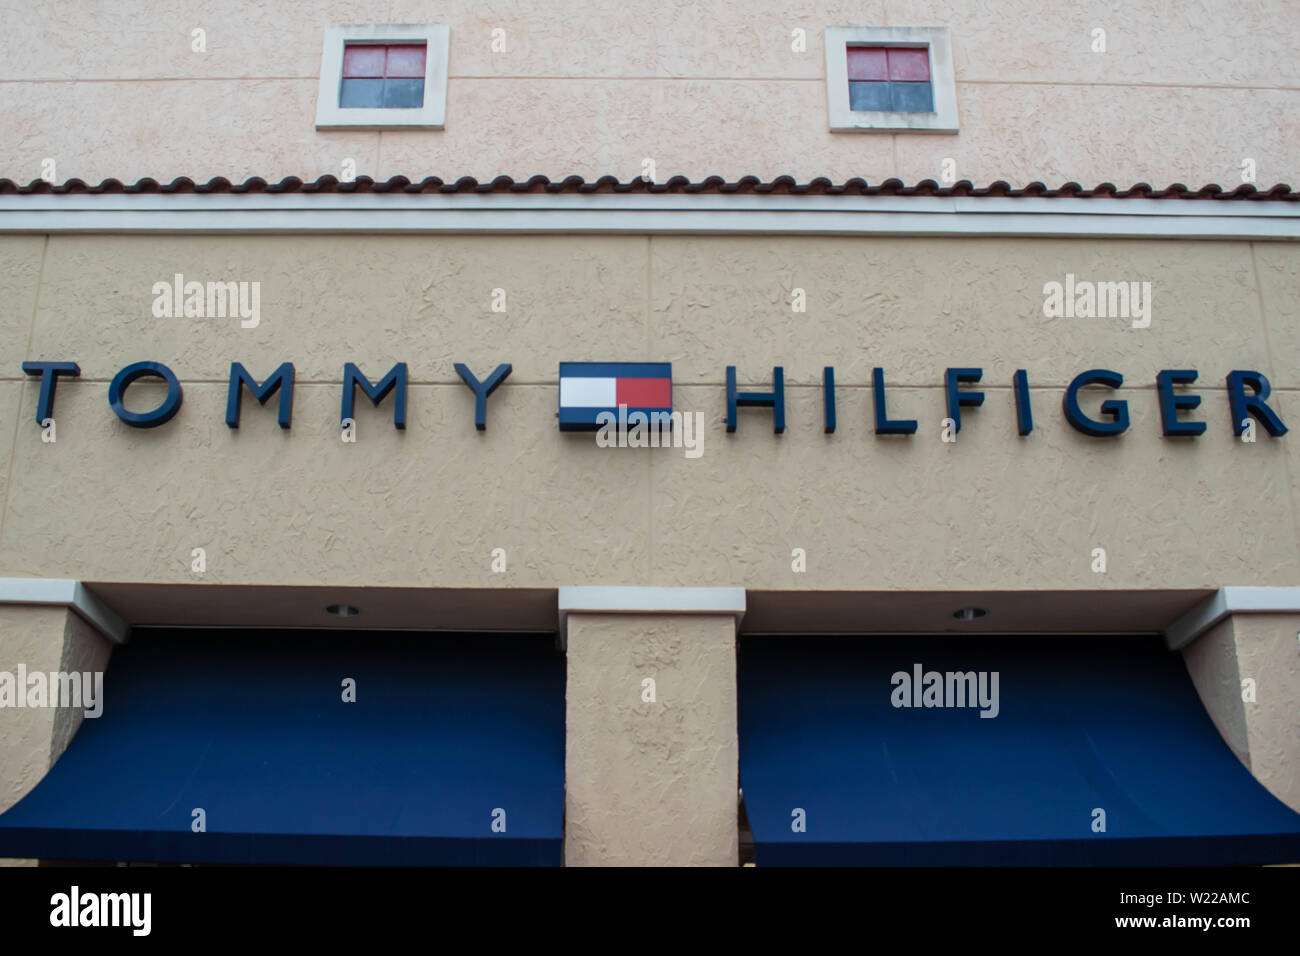 3b7d8d5b Orlando, Florida. June 6, 2019 . Tommy Hilfiger sign and logo at Premium